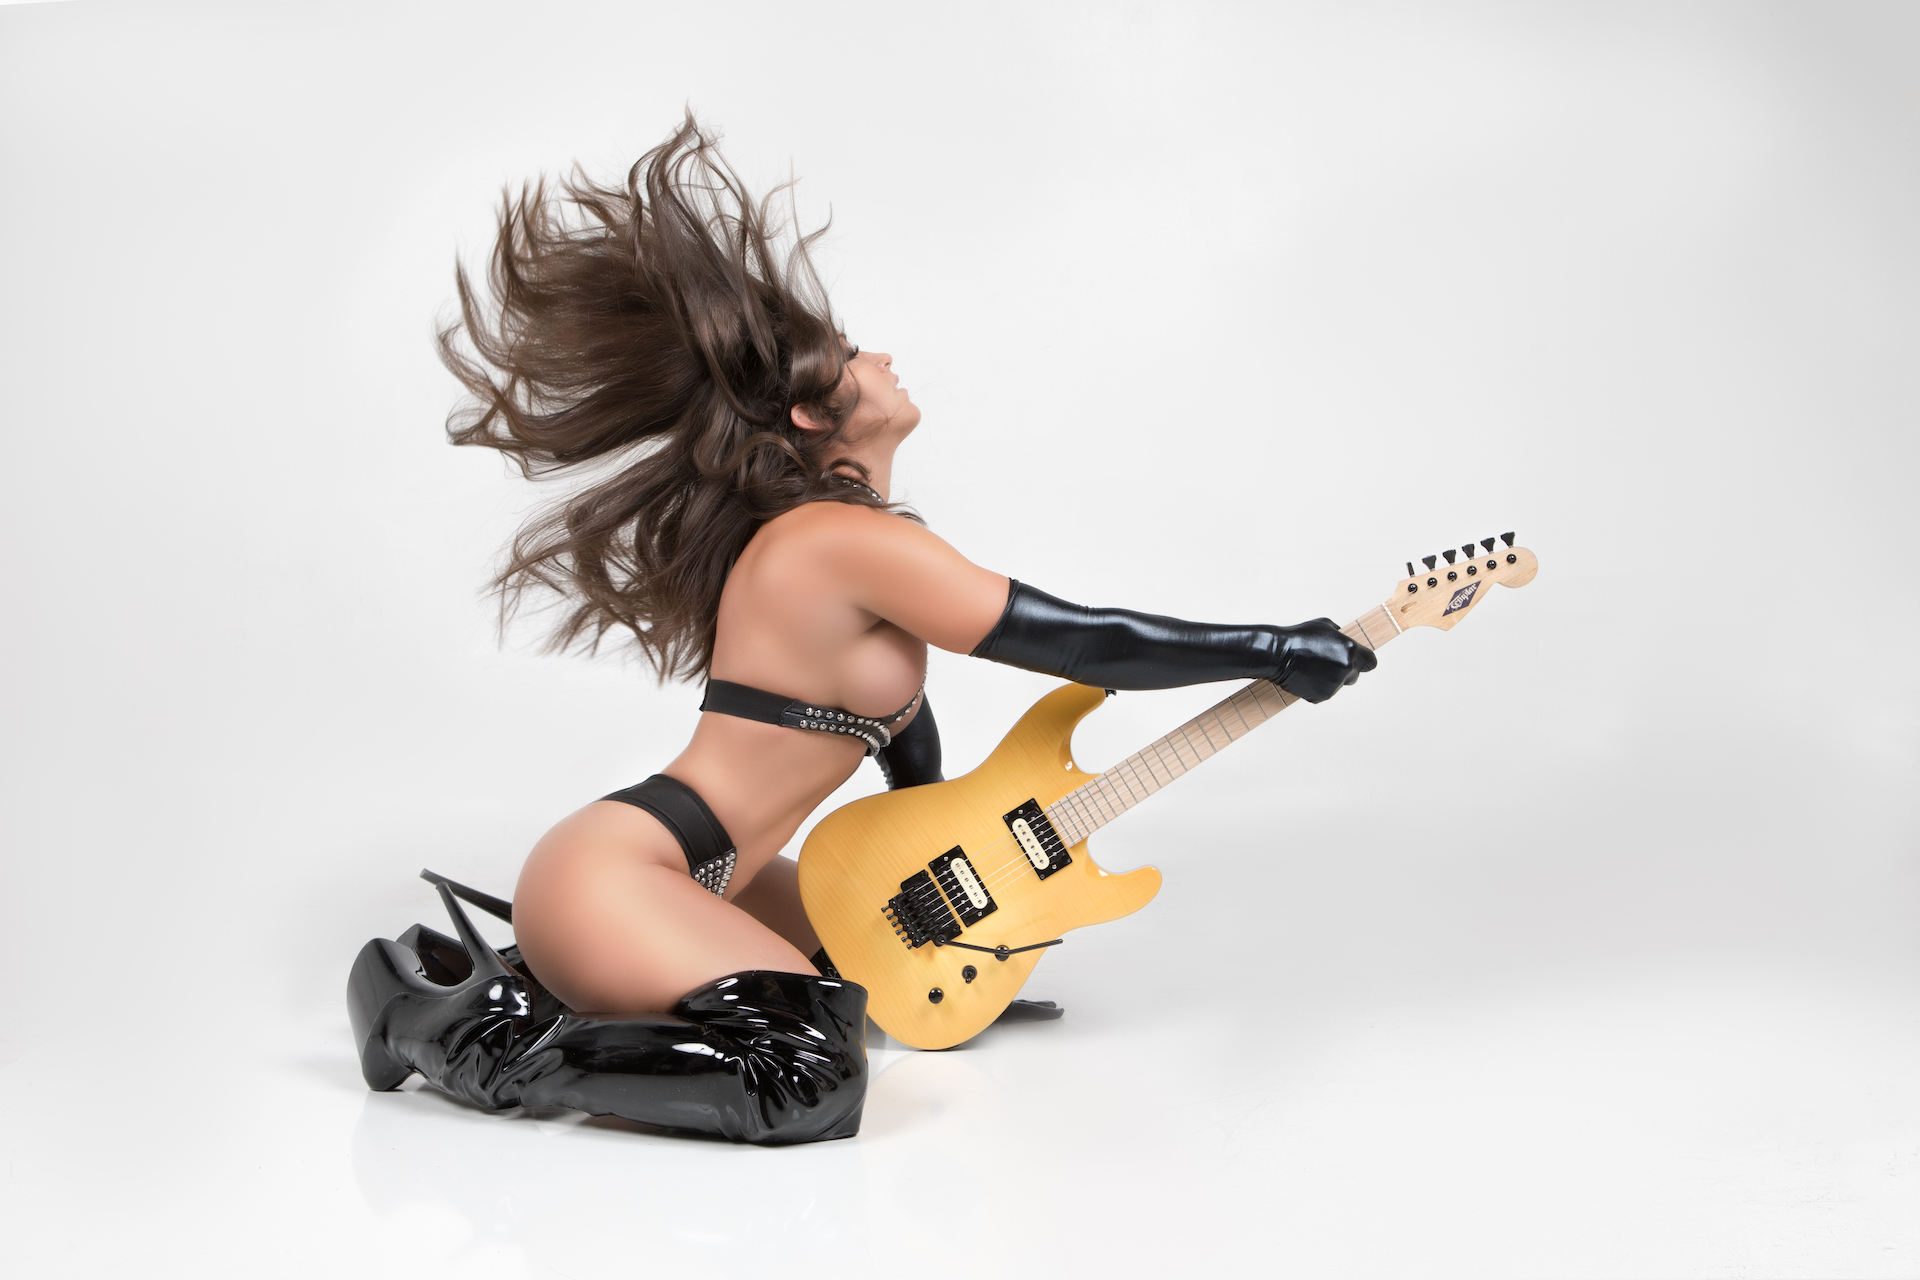 Guitar1017Courtney - IMGL9168-Edit.jpg